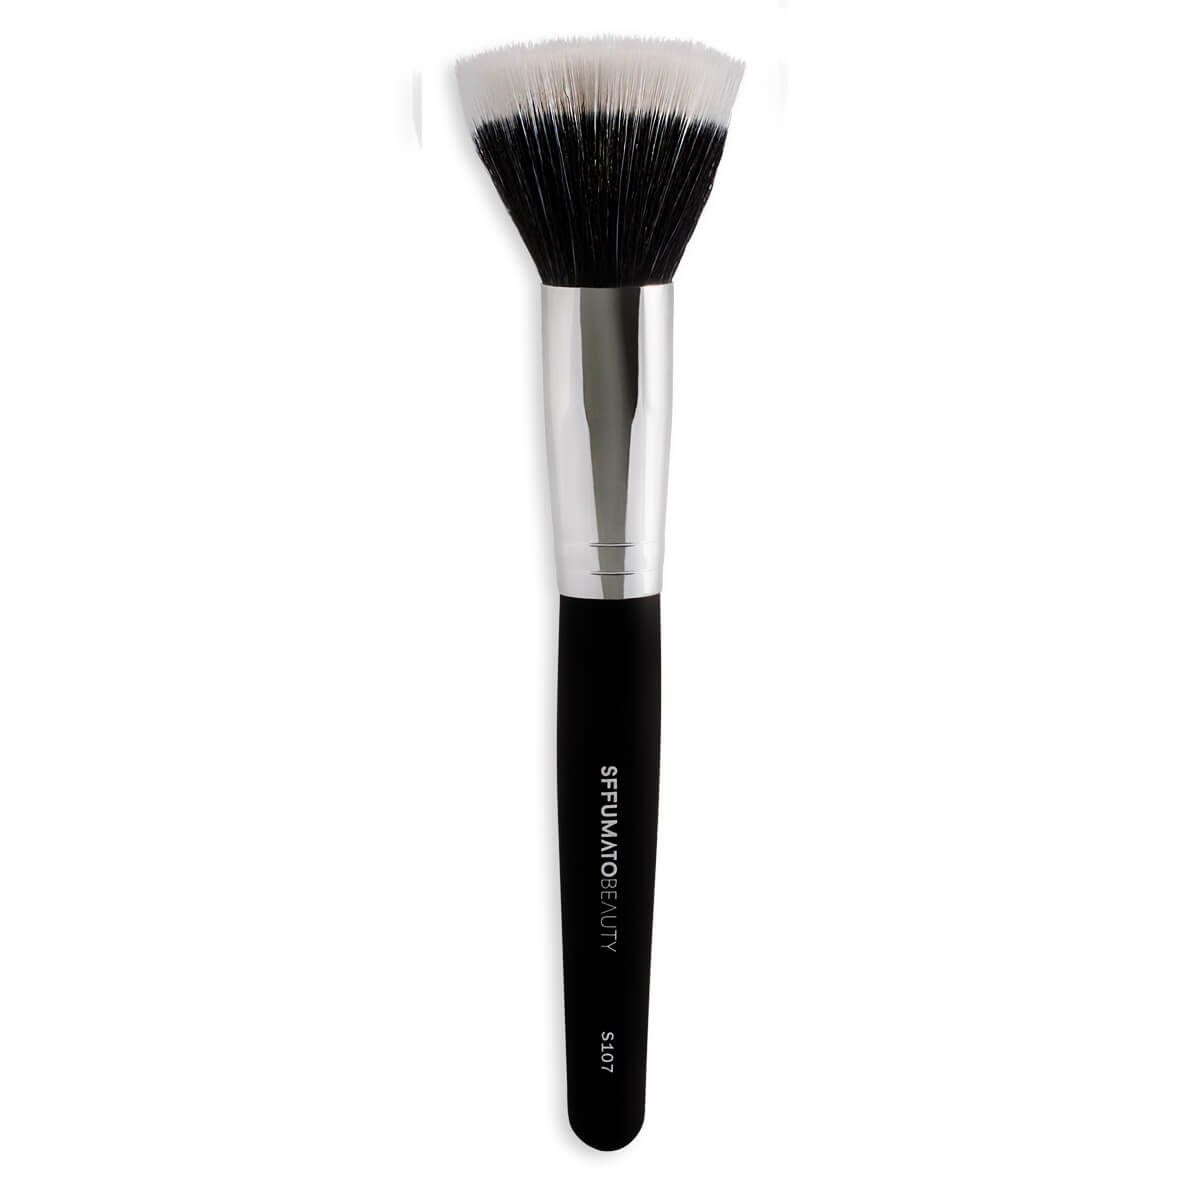 S107 - Pincel Duo Fiber Grande Profissional Sffumato Beauty